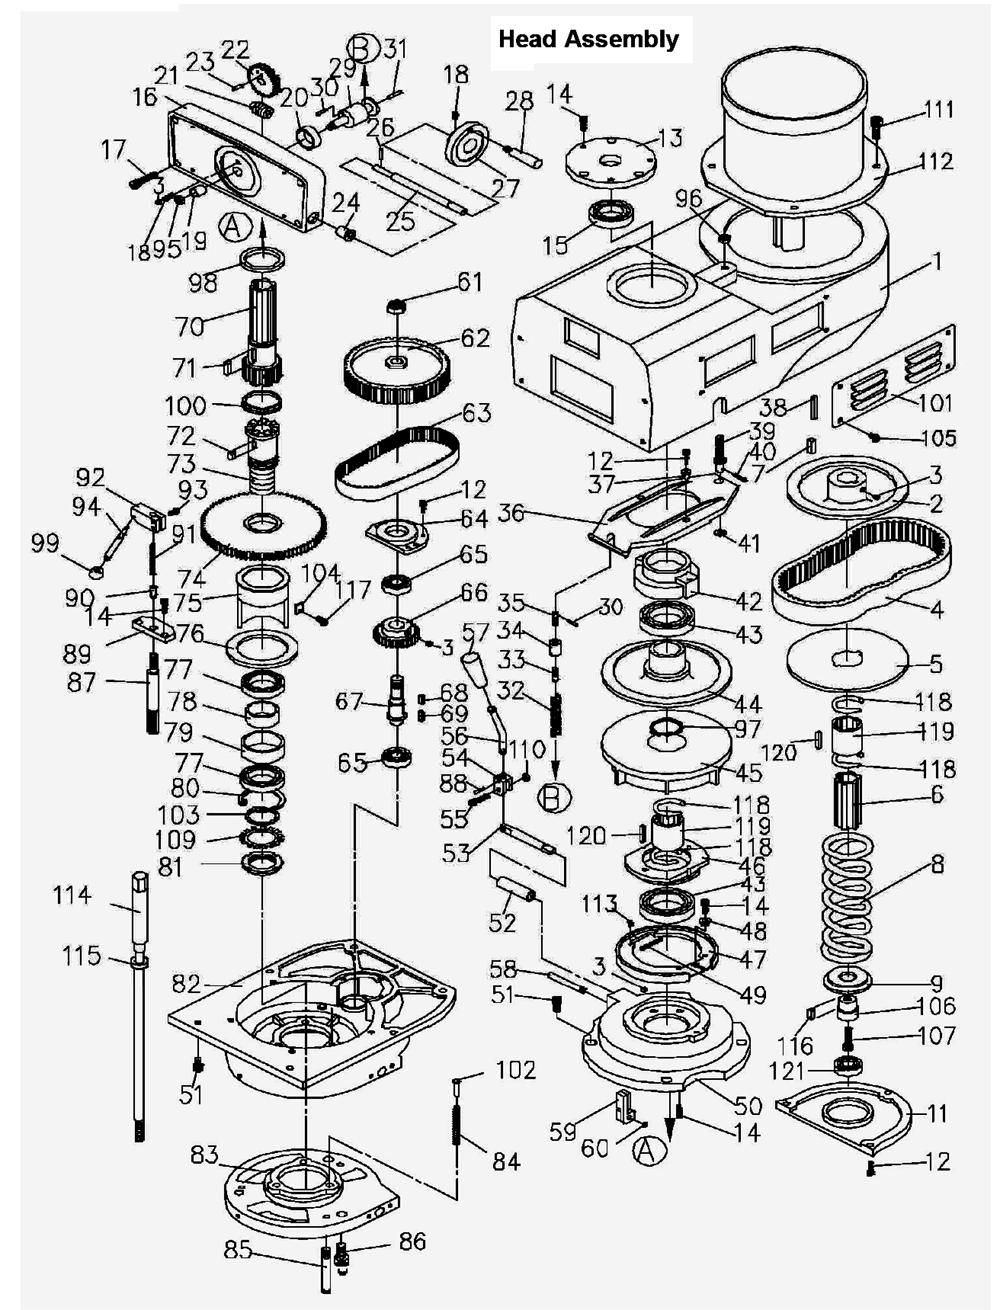 Vertical Milling Machine Diagram Mill Conveyor Jet Planer Wiring Download